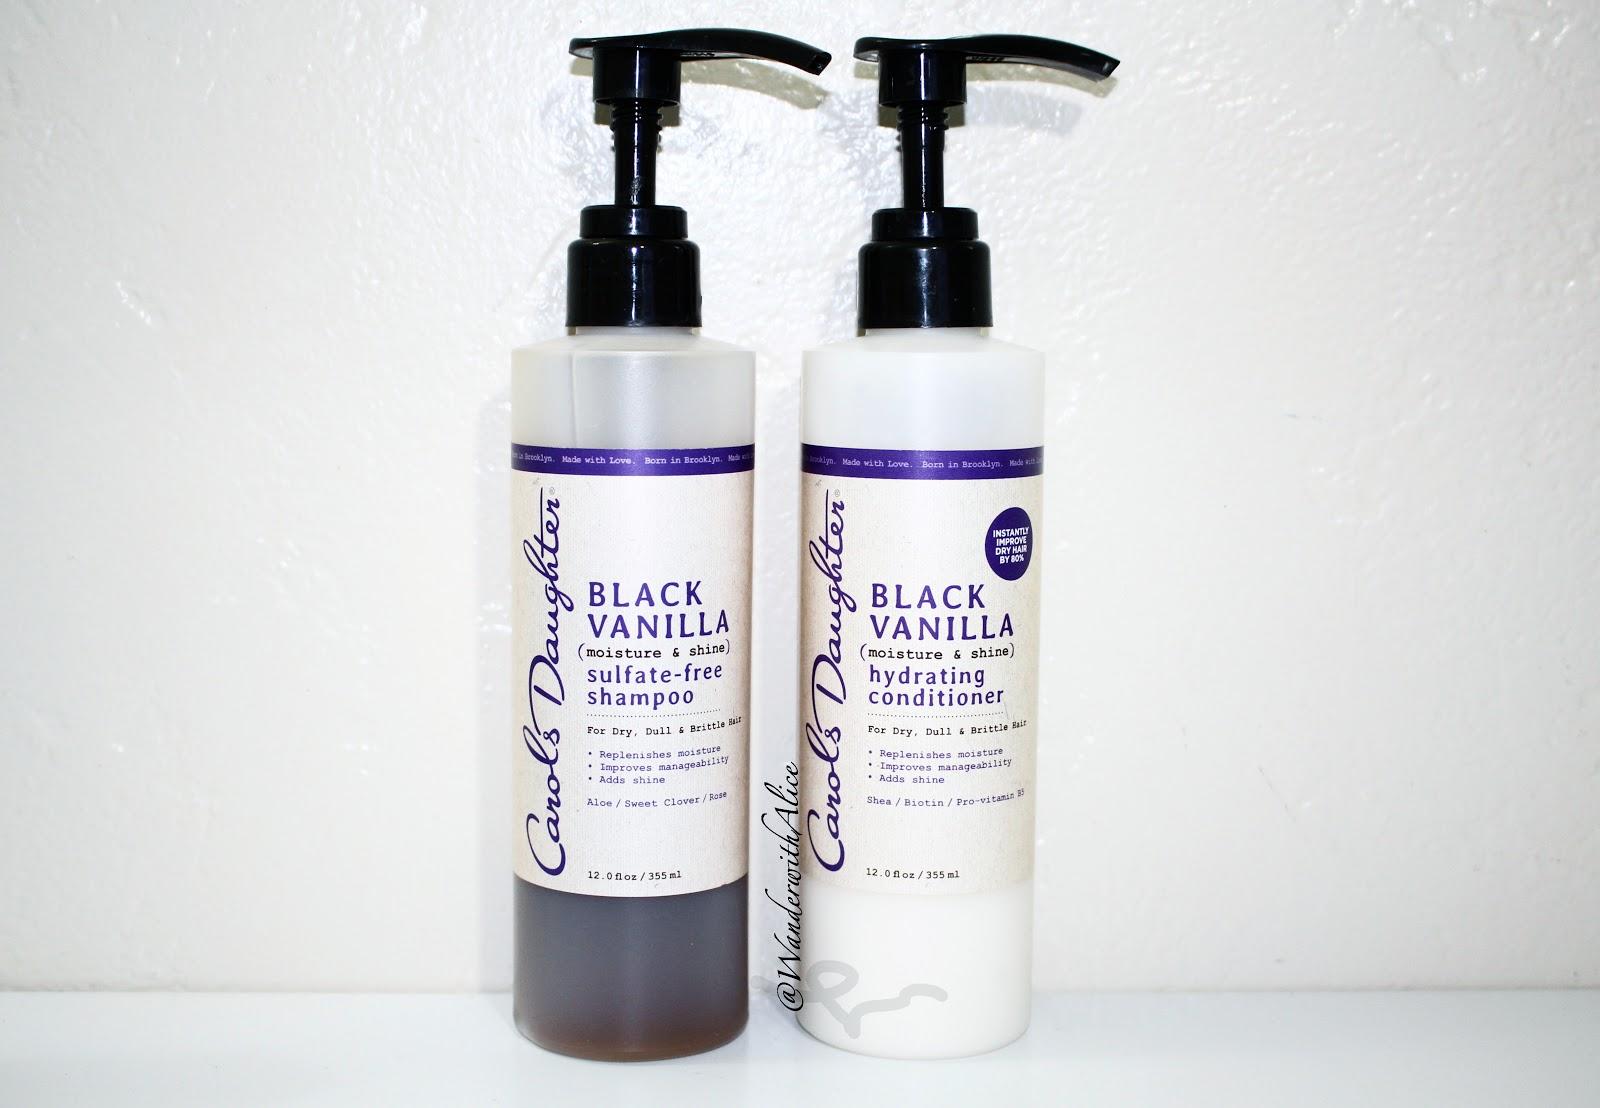 Carol's Daughter] Black Vanilla Shampoo & Conditioner Review